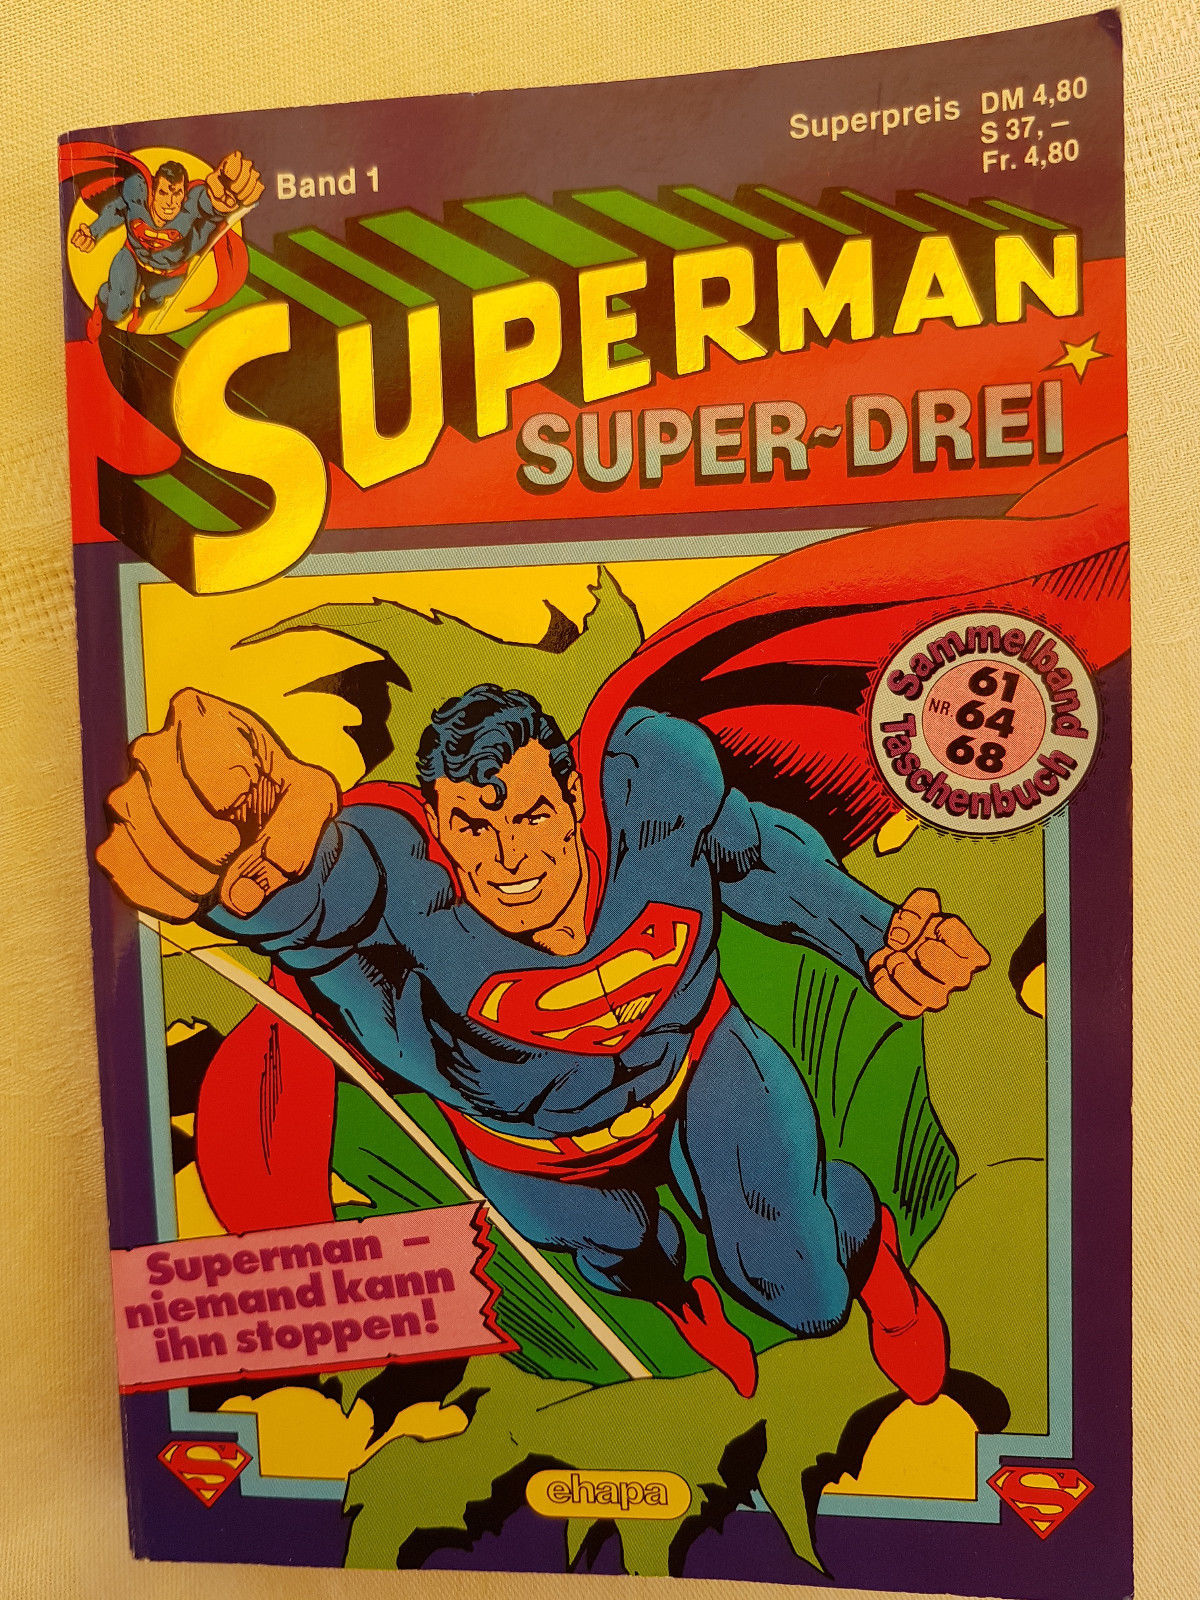 Superman SUPER-DREI Band 1 Comics Sammelband Taschenbuch Nr. 61, 64, 68 ehapa